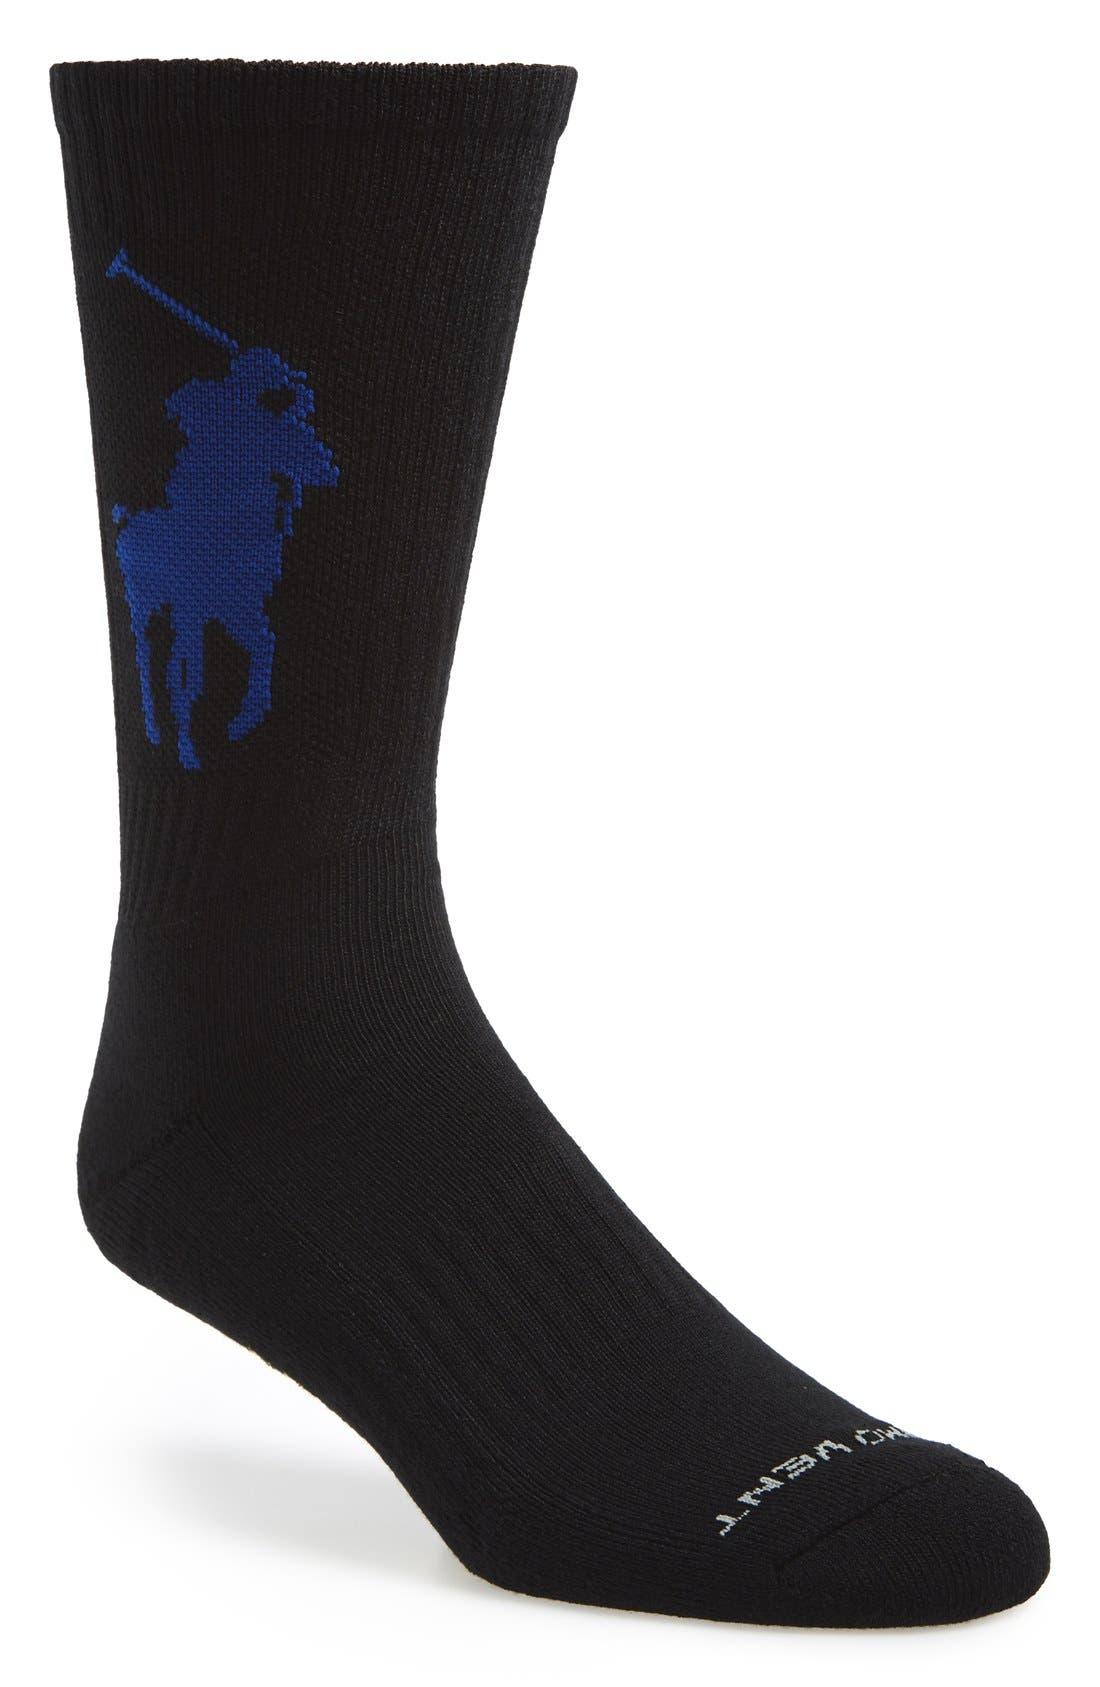 Alternate Image 1 Selected - Polo Ralph Lauren Performance Crew Socks